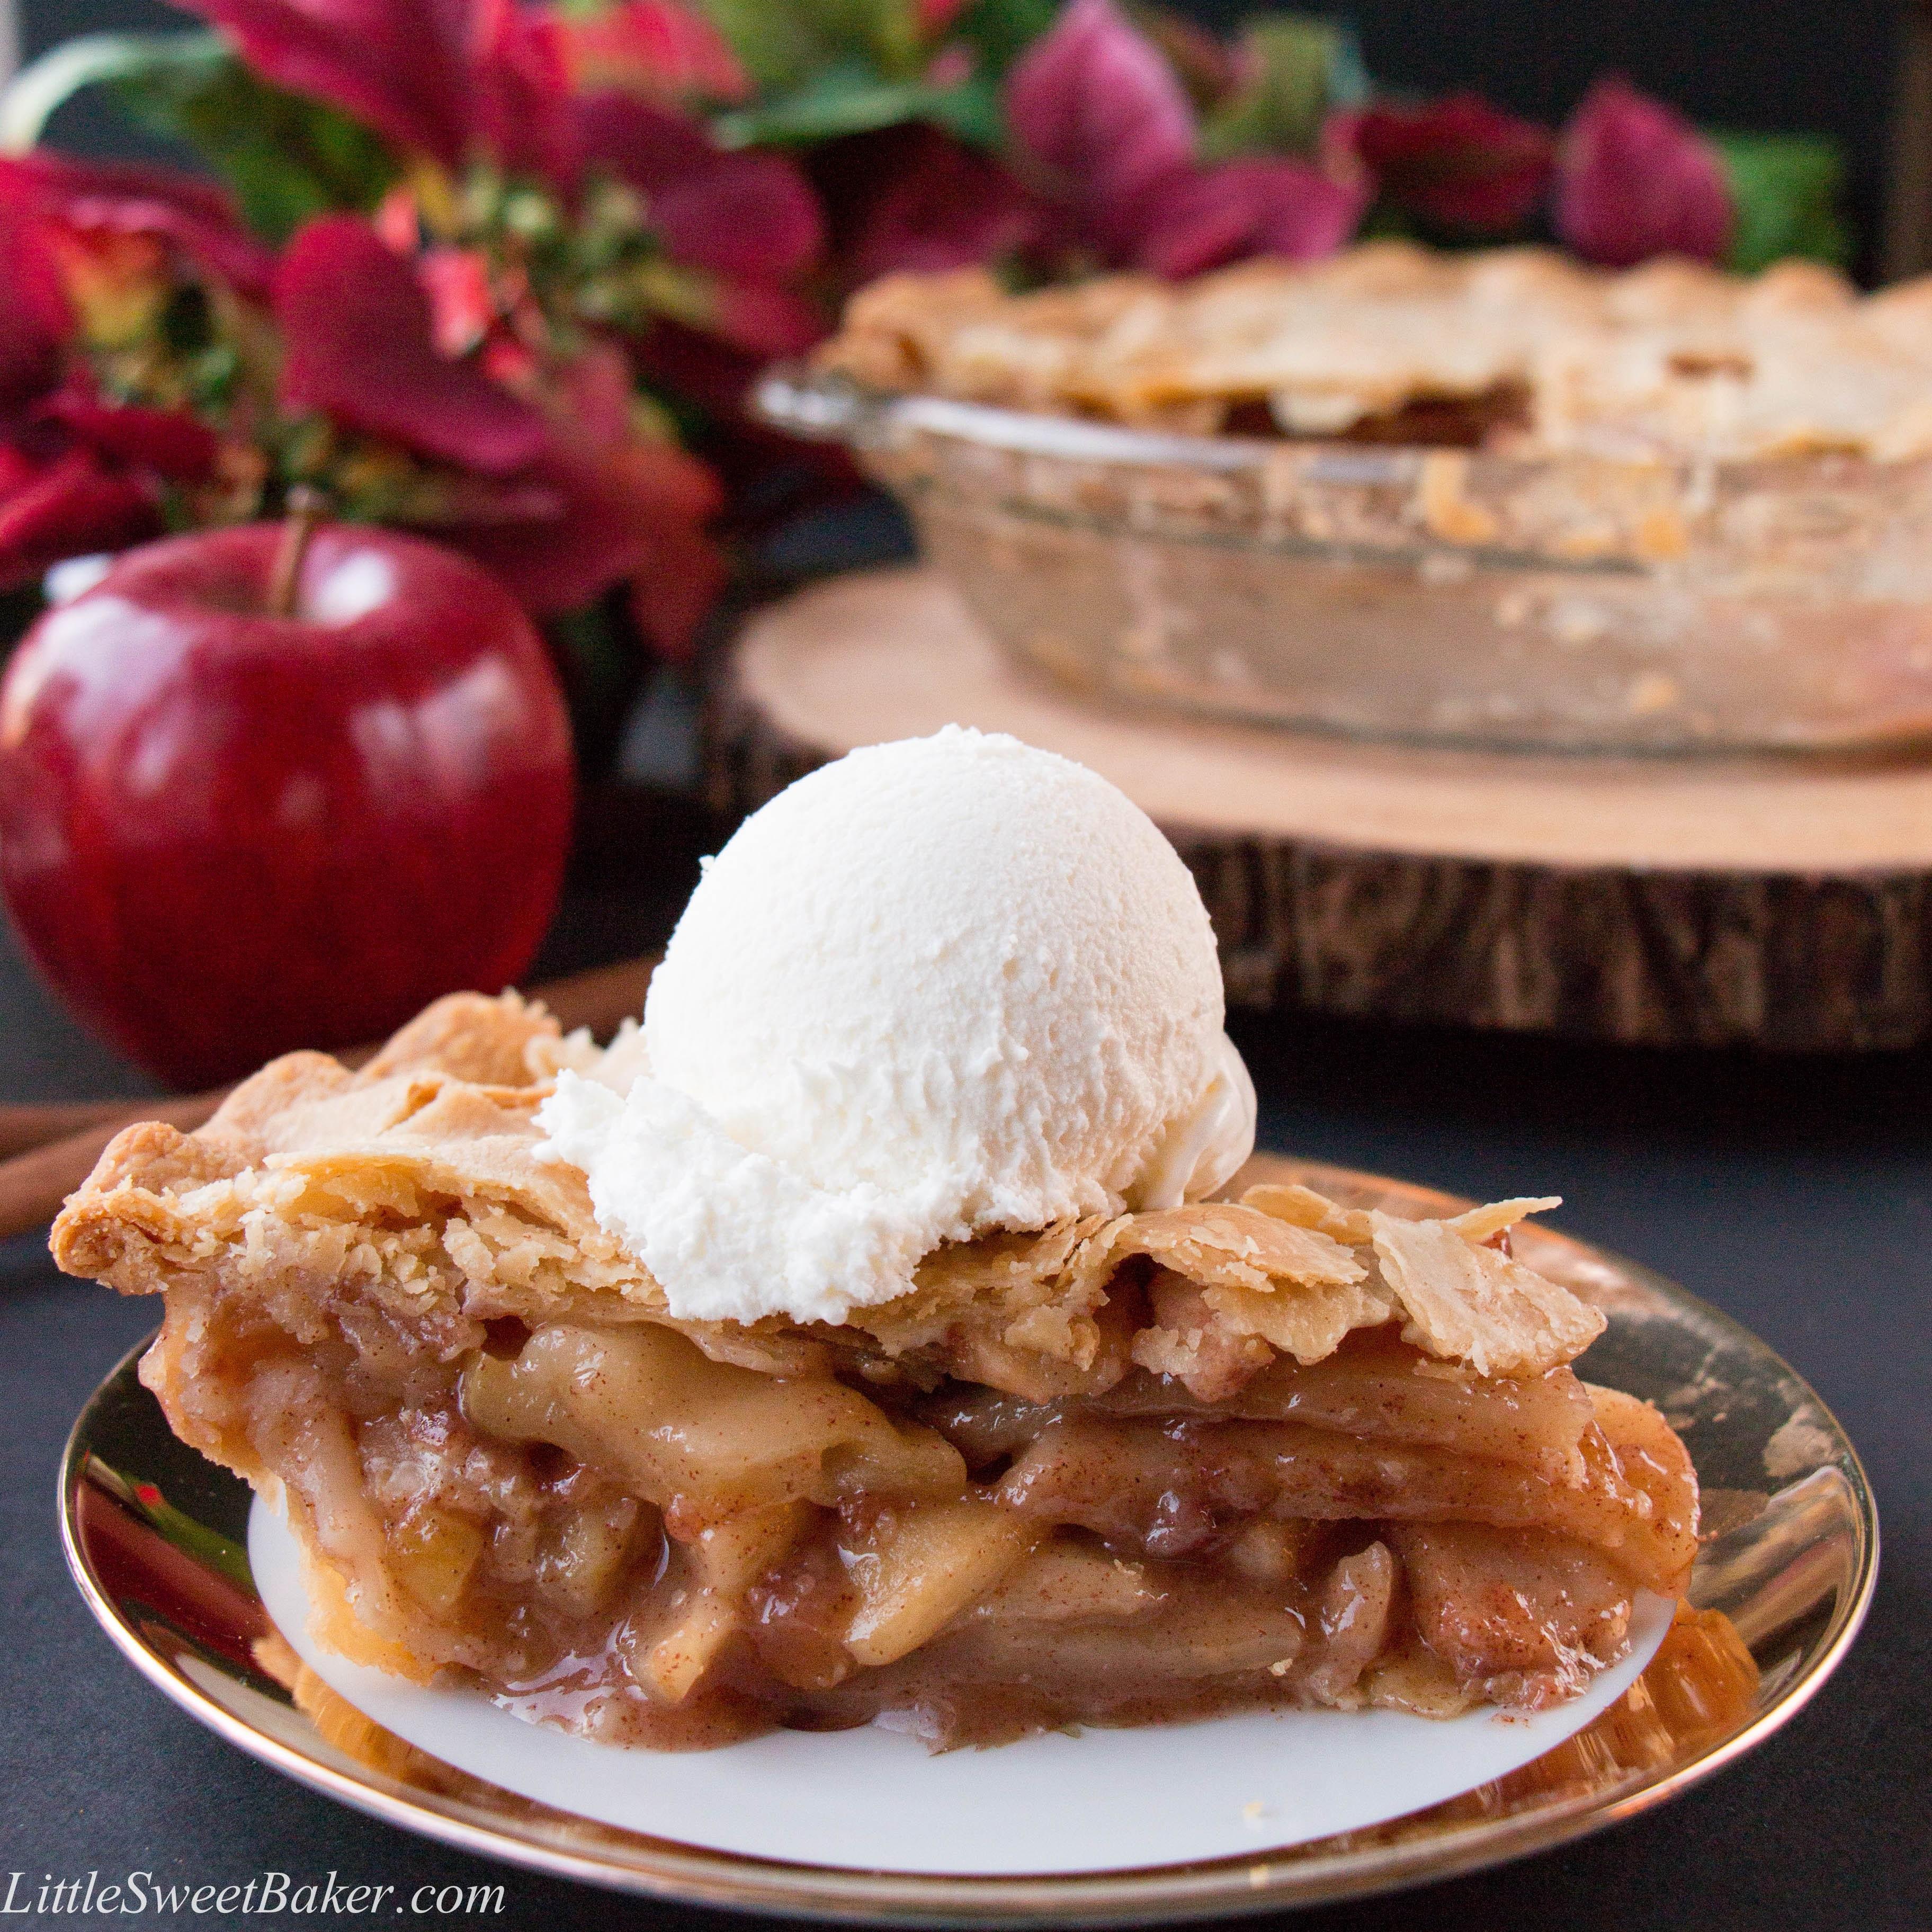 Apple Pie Ingredients  Easy Homemade Apple Pie video Little Sweet Baker